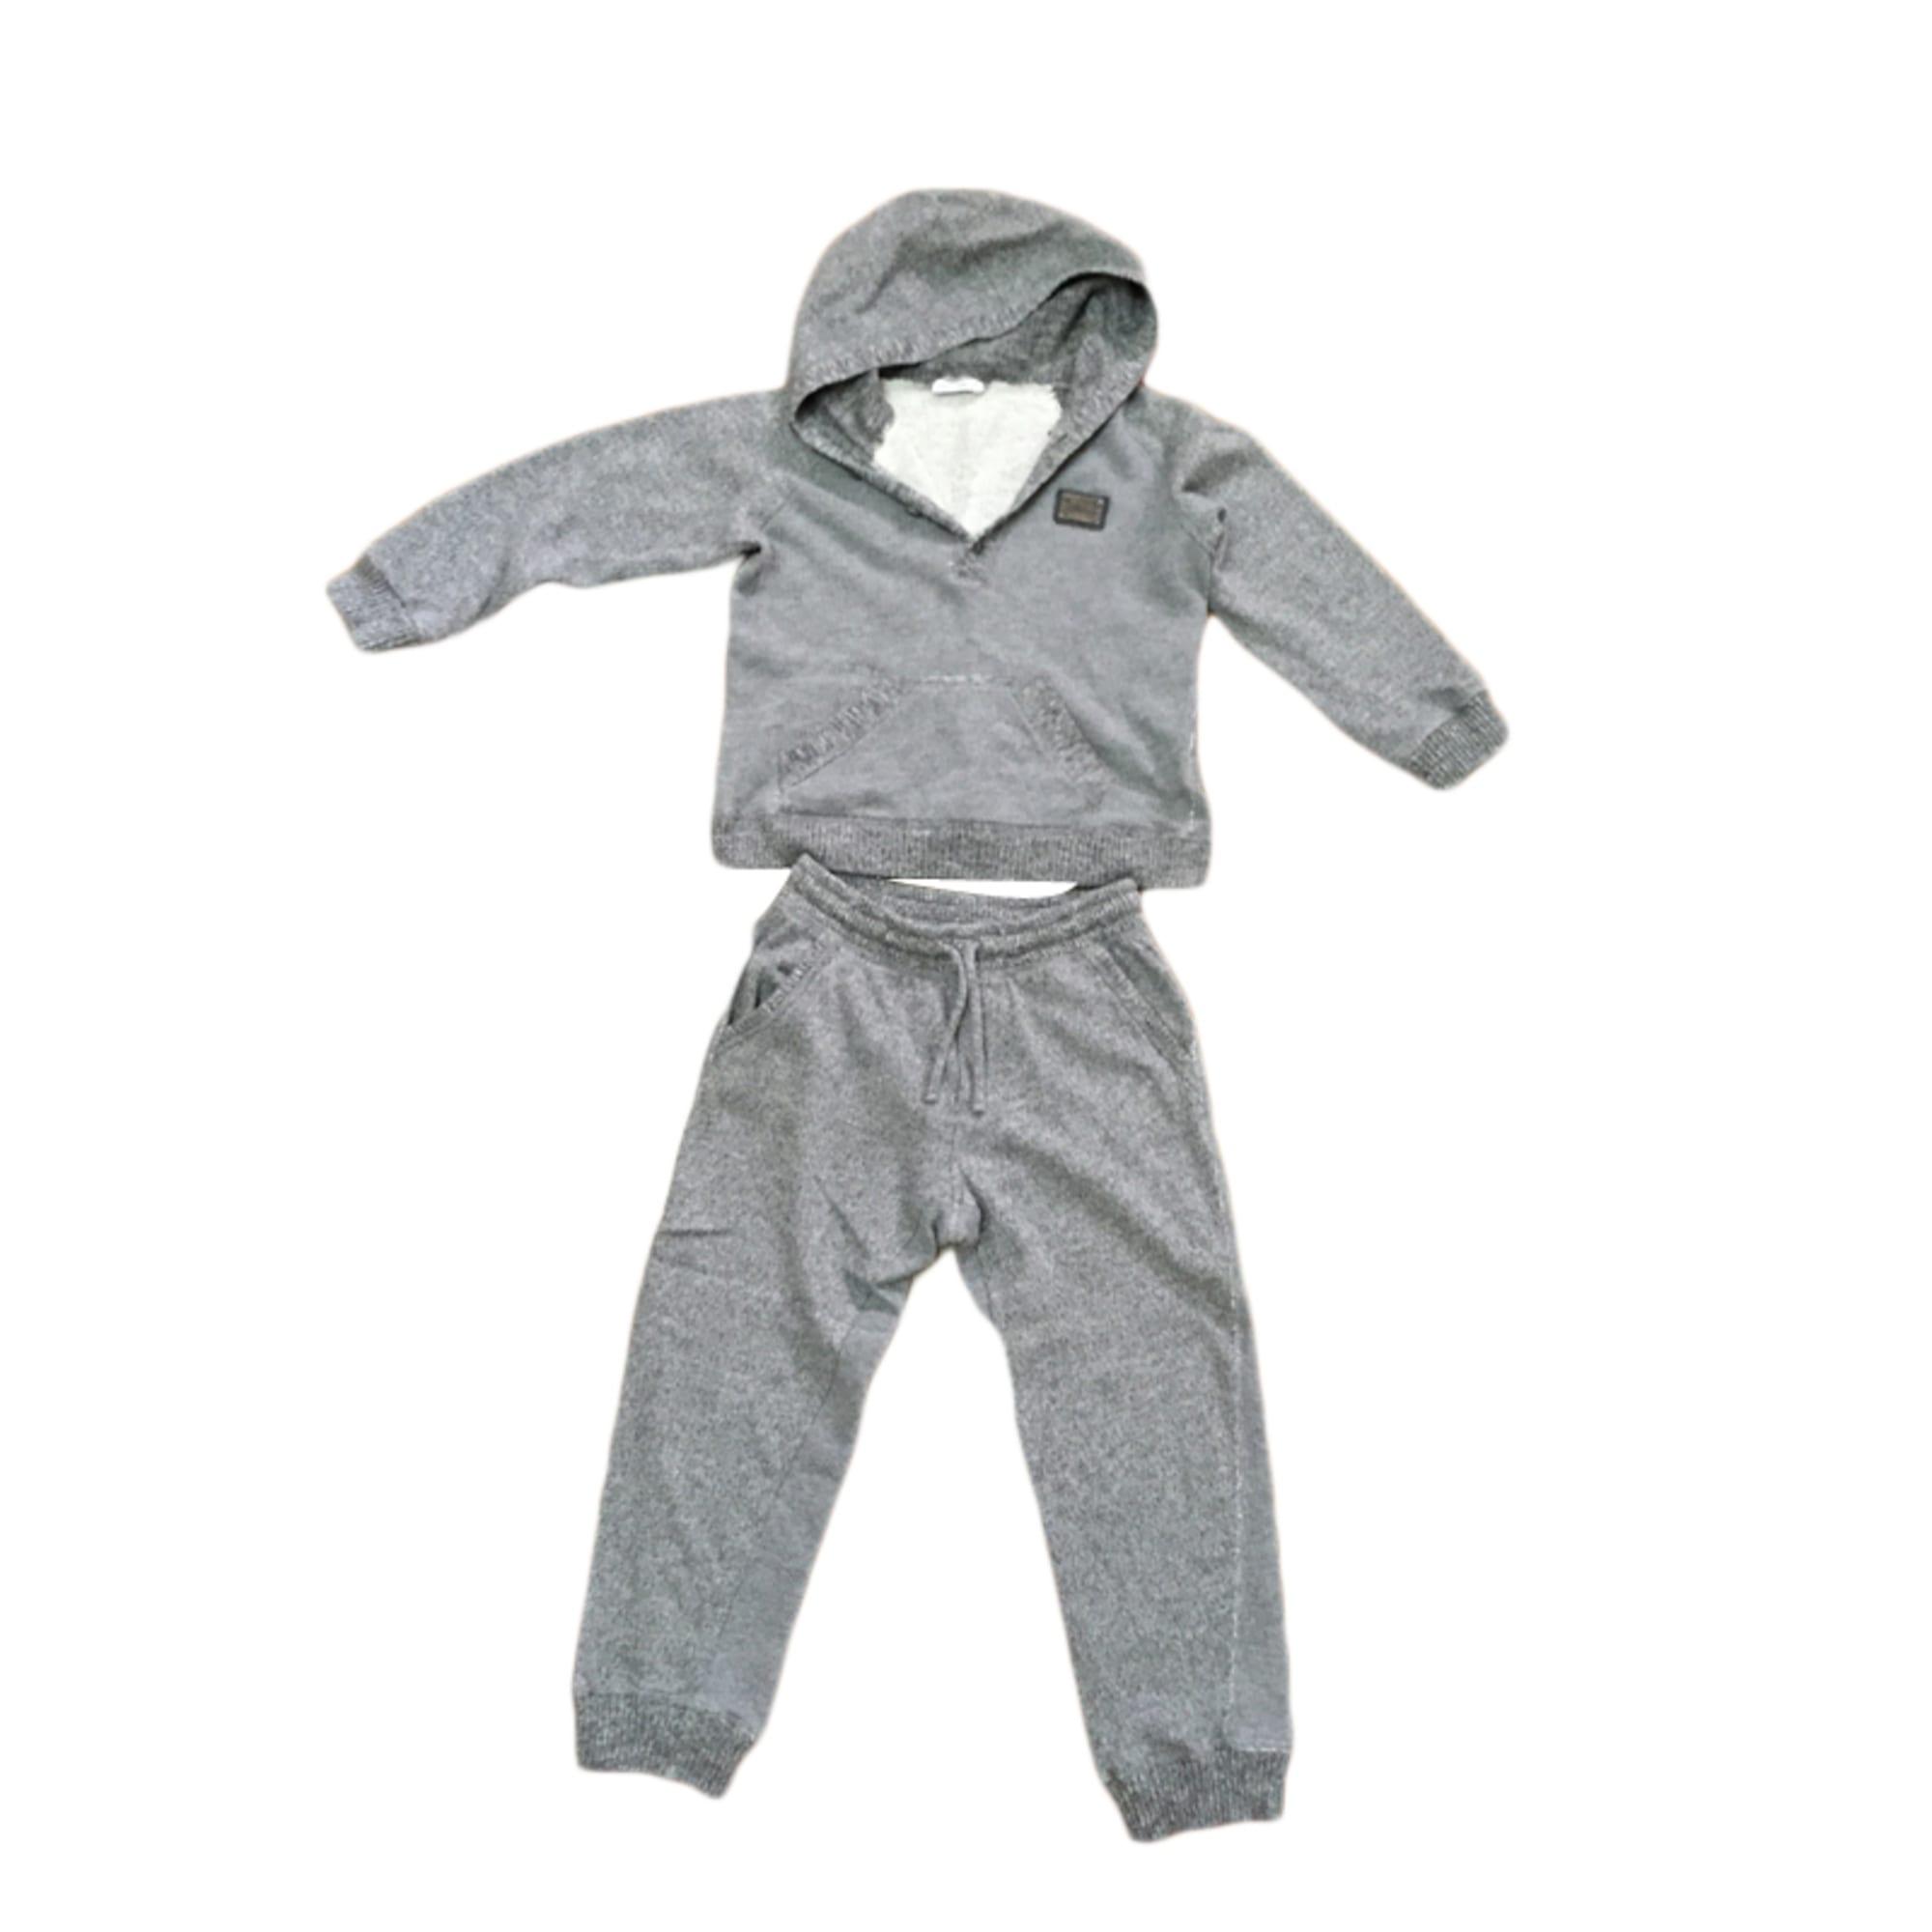 Pants Set, Outfit DOLCE & GABBANA Gray, charcoal